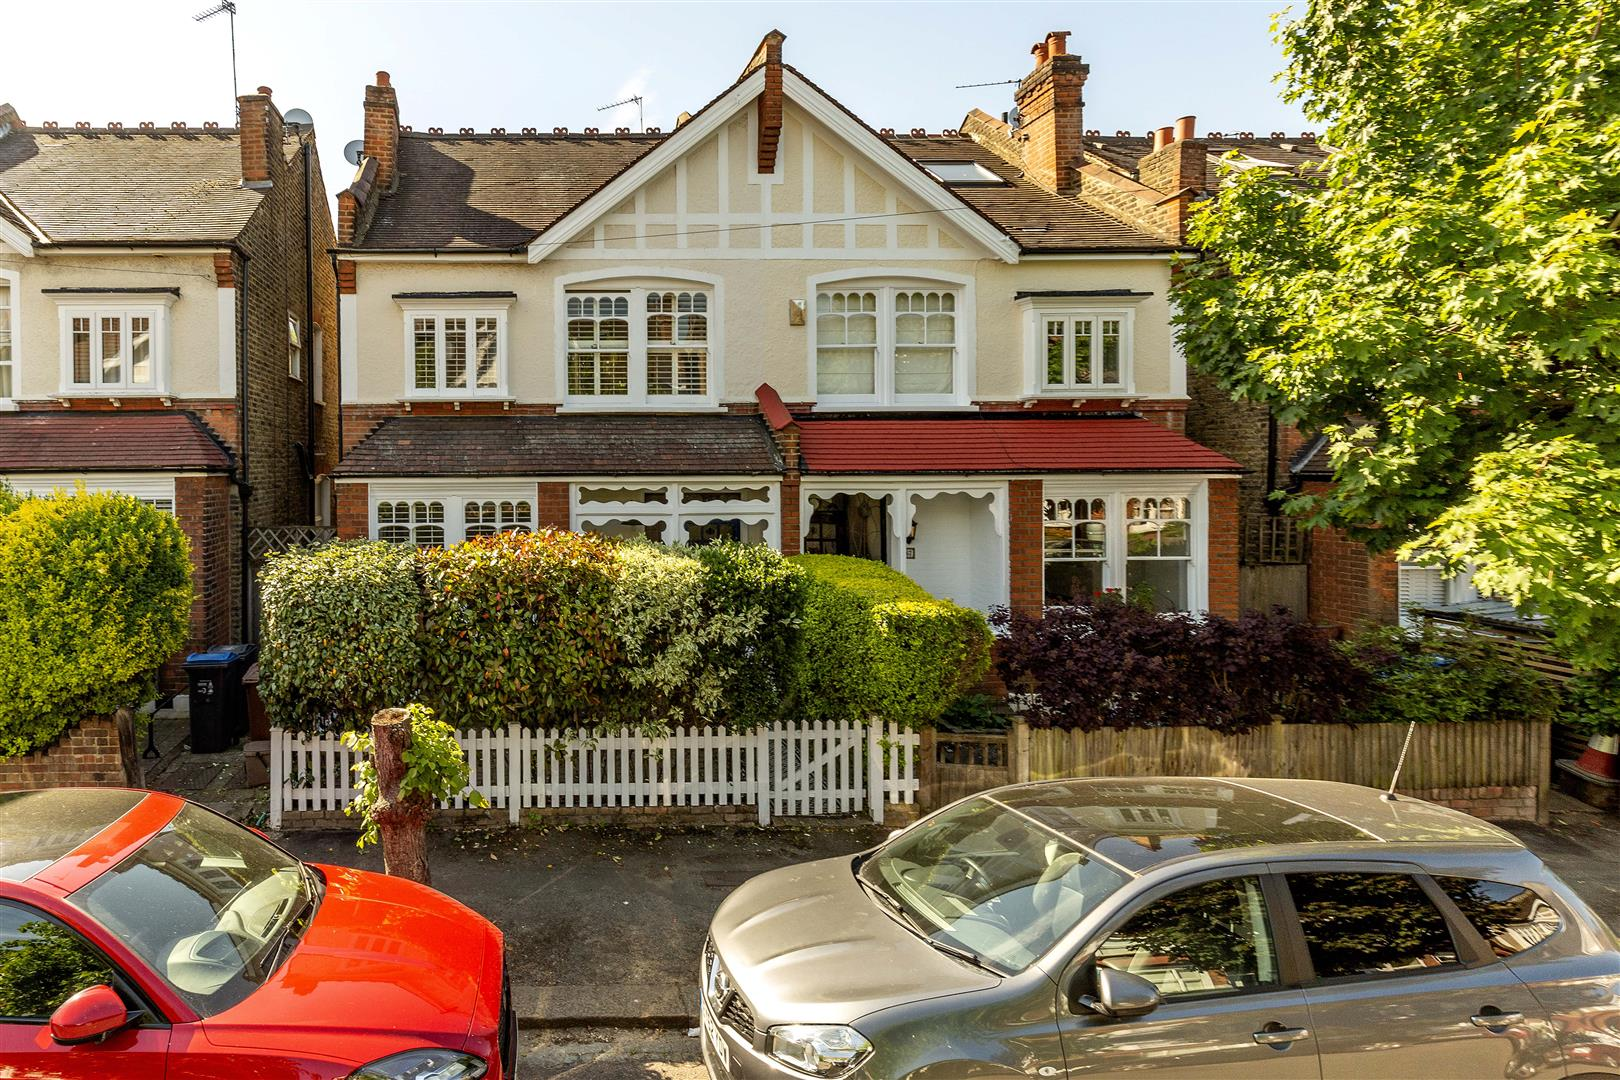 Stanton Road, Wimbledon - Andrew Scott Robertson